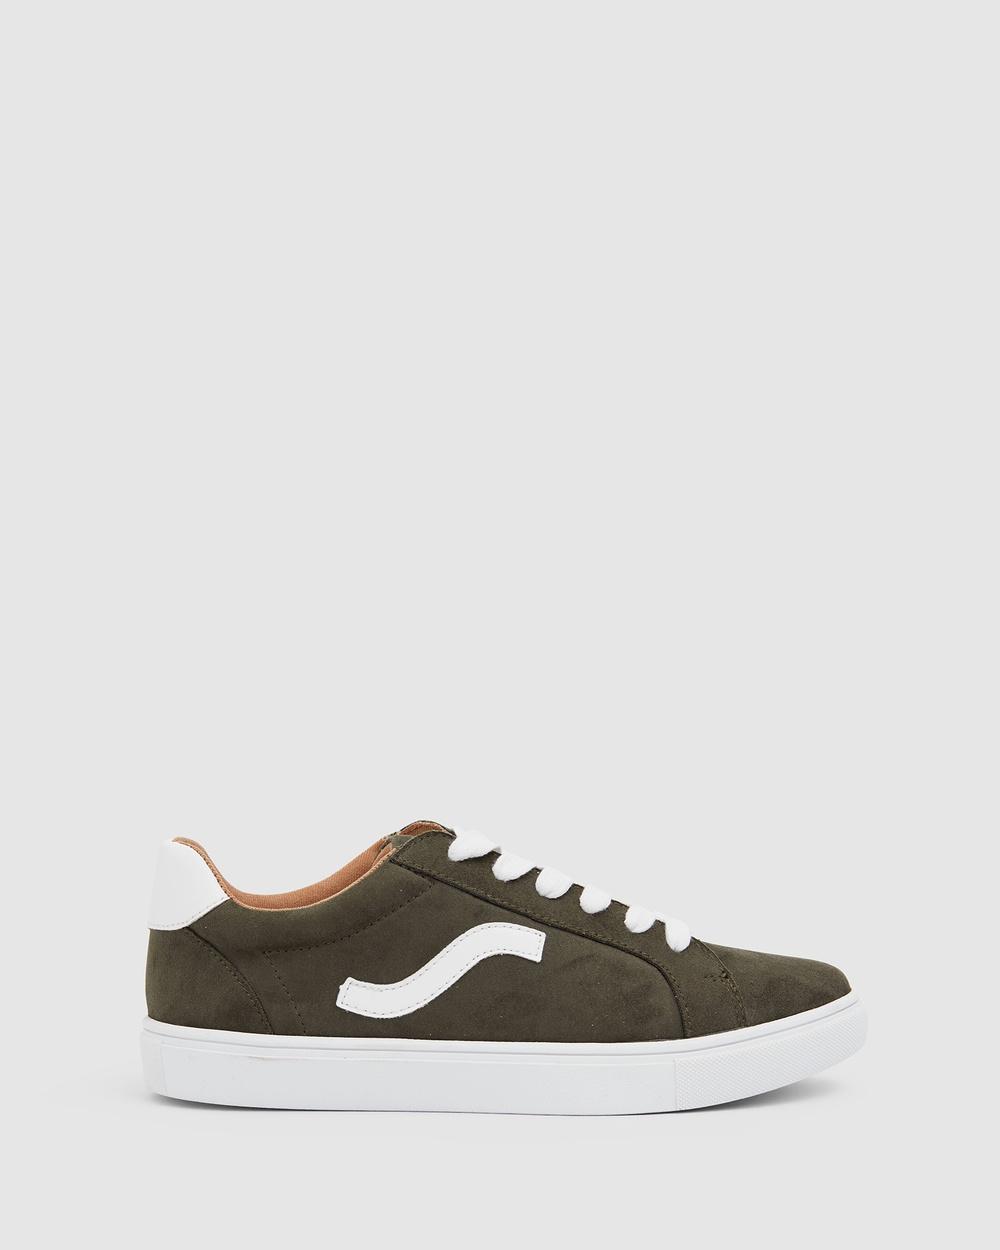 Sandler Swerve Sneakers KHAKI Australia